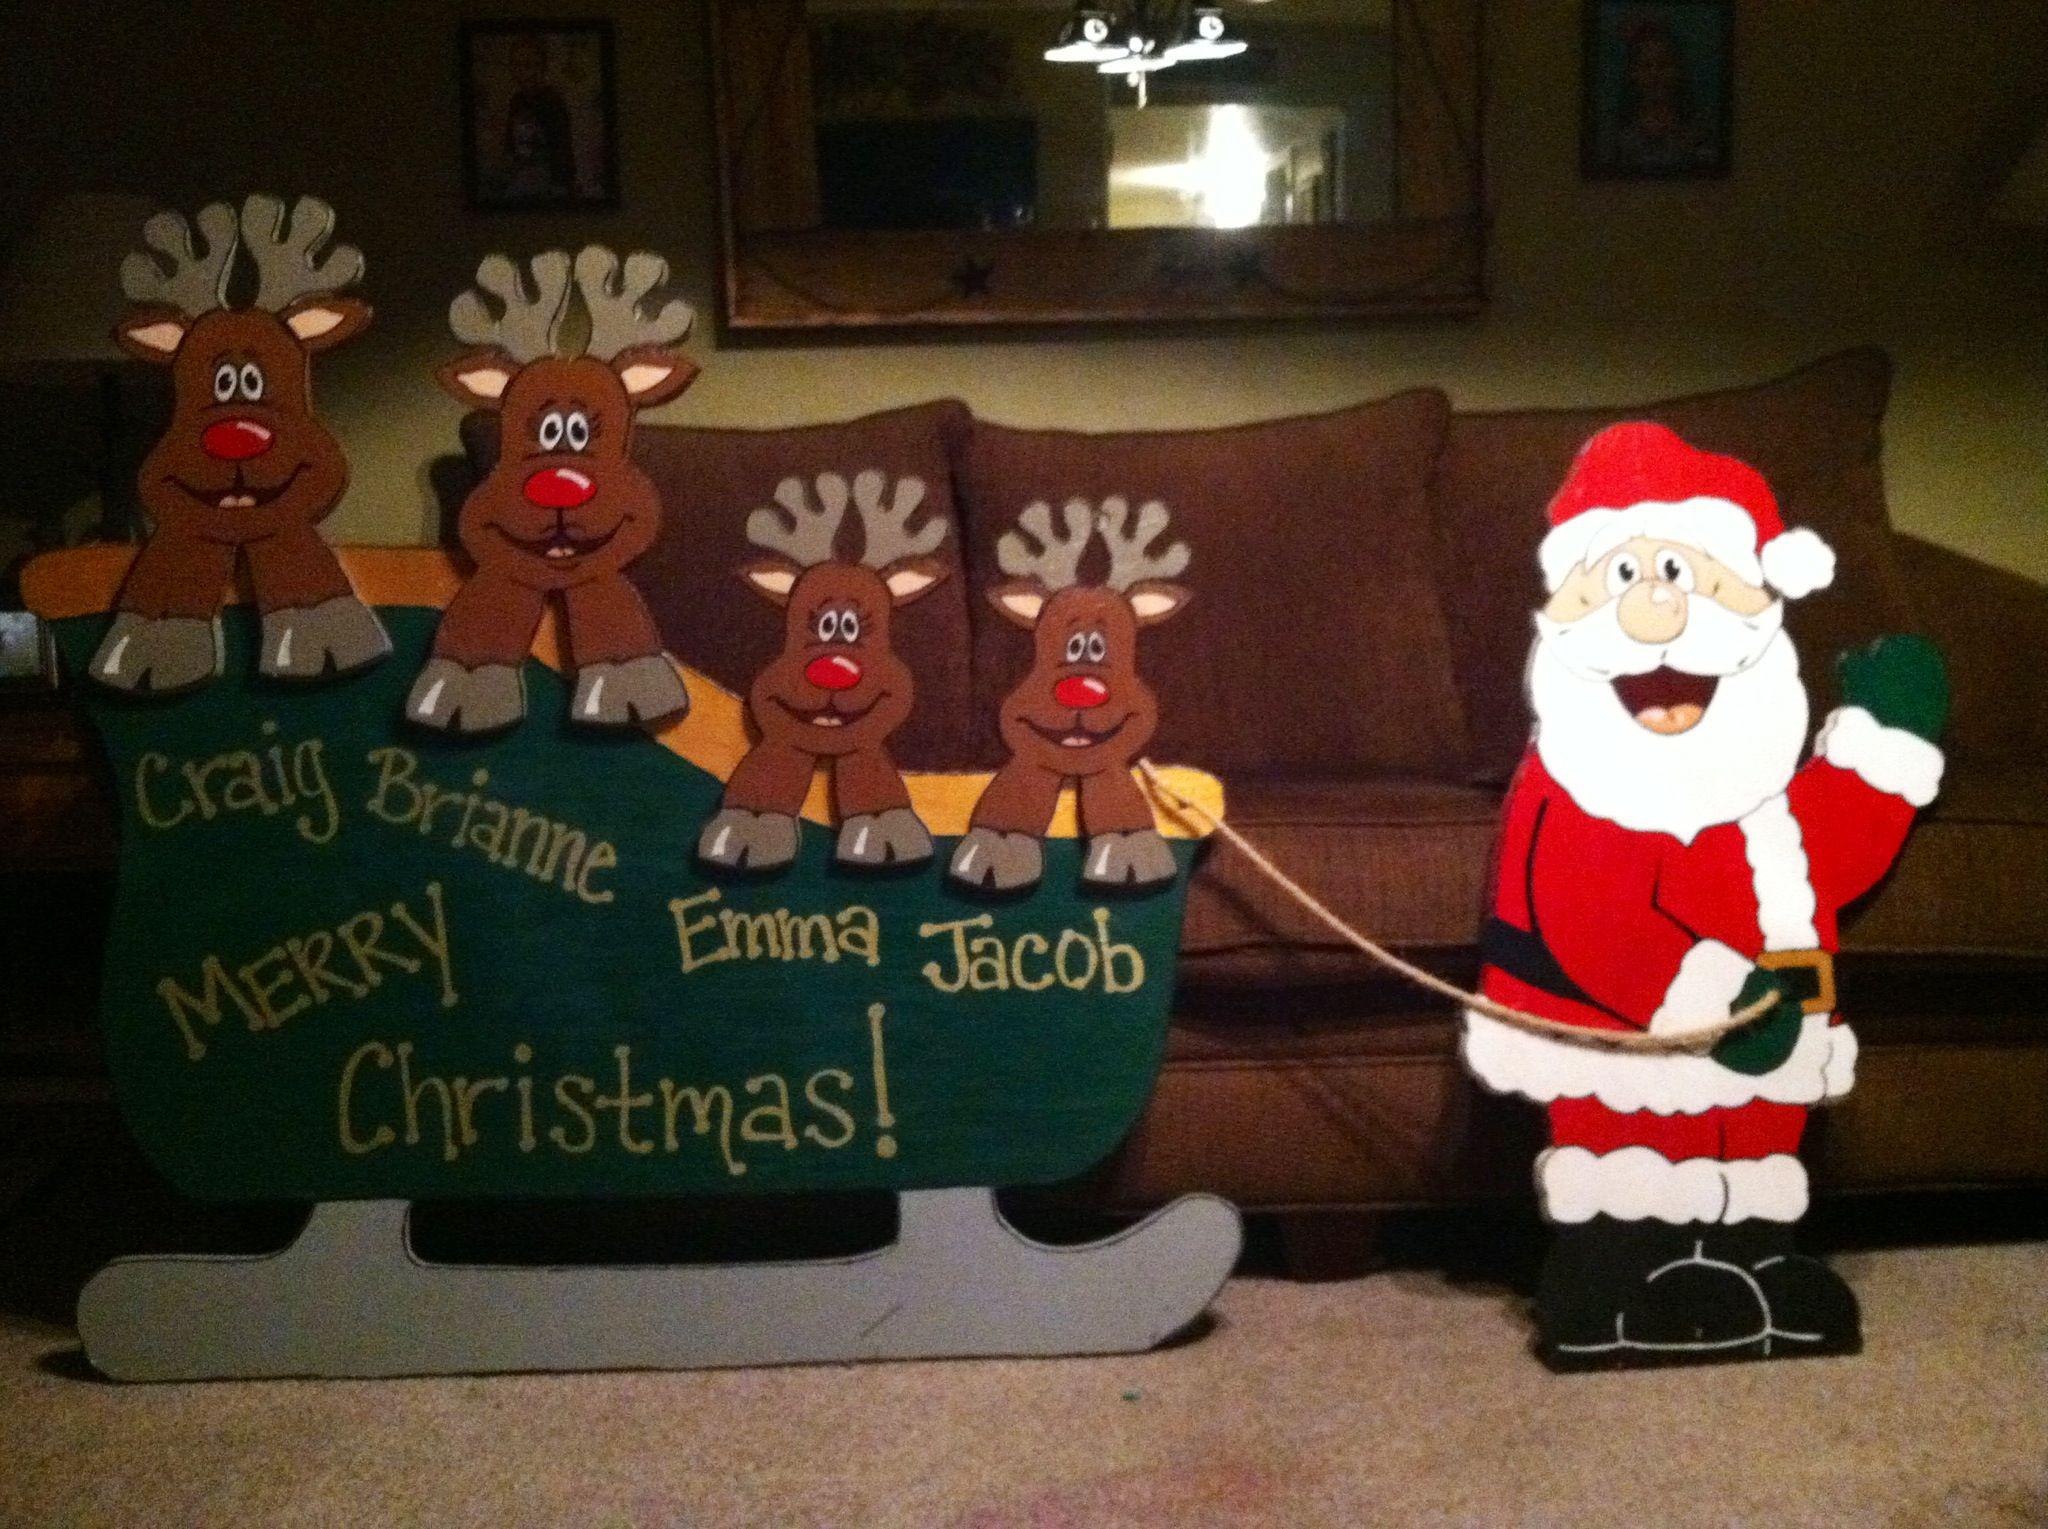 Christmas Wood Art  Wooden yard art Christmas sleigh with reindeer and Santa